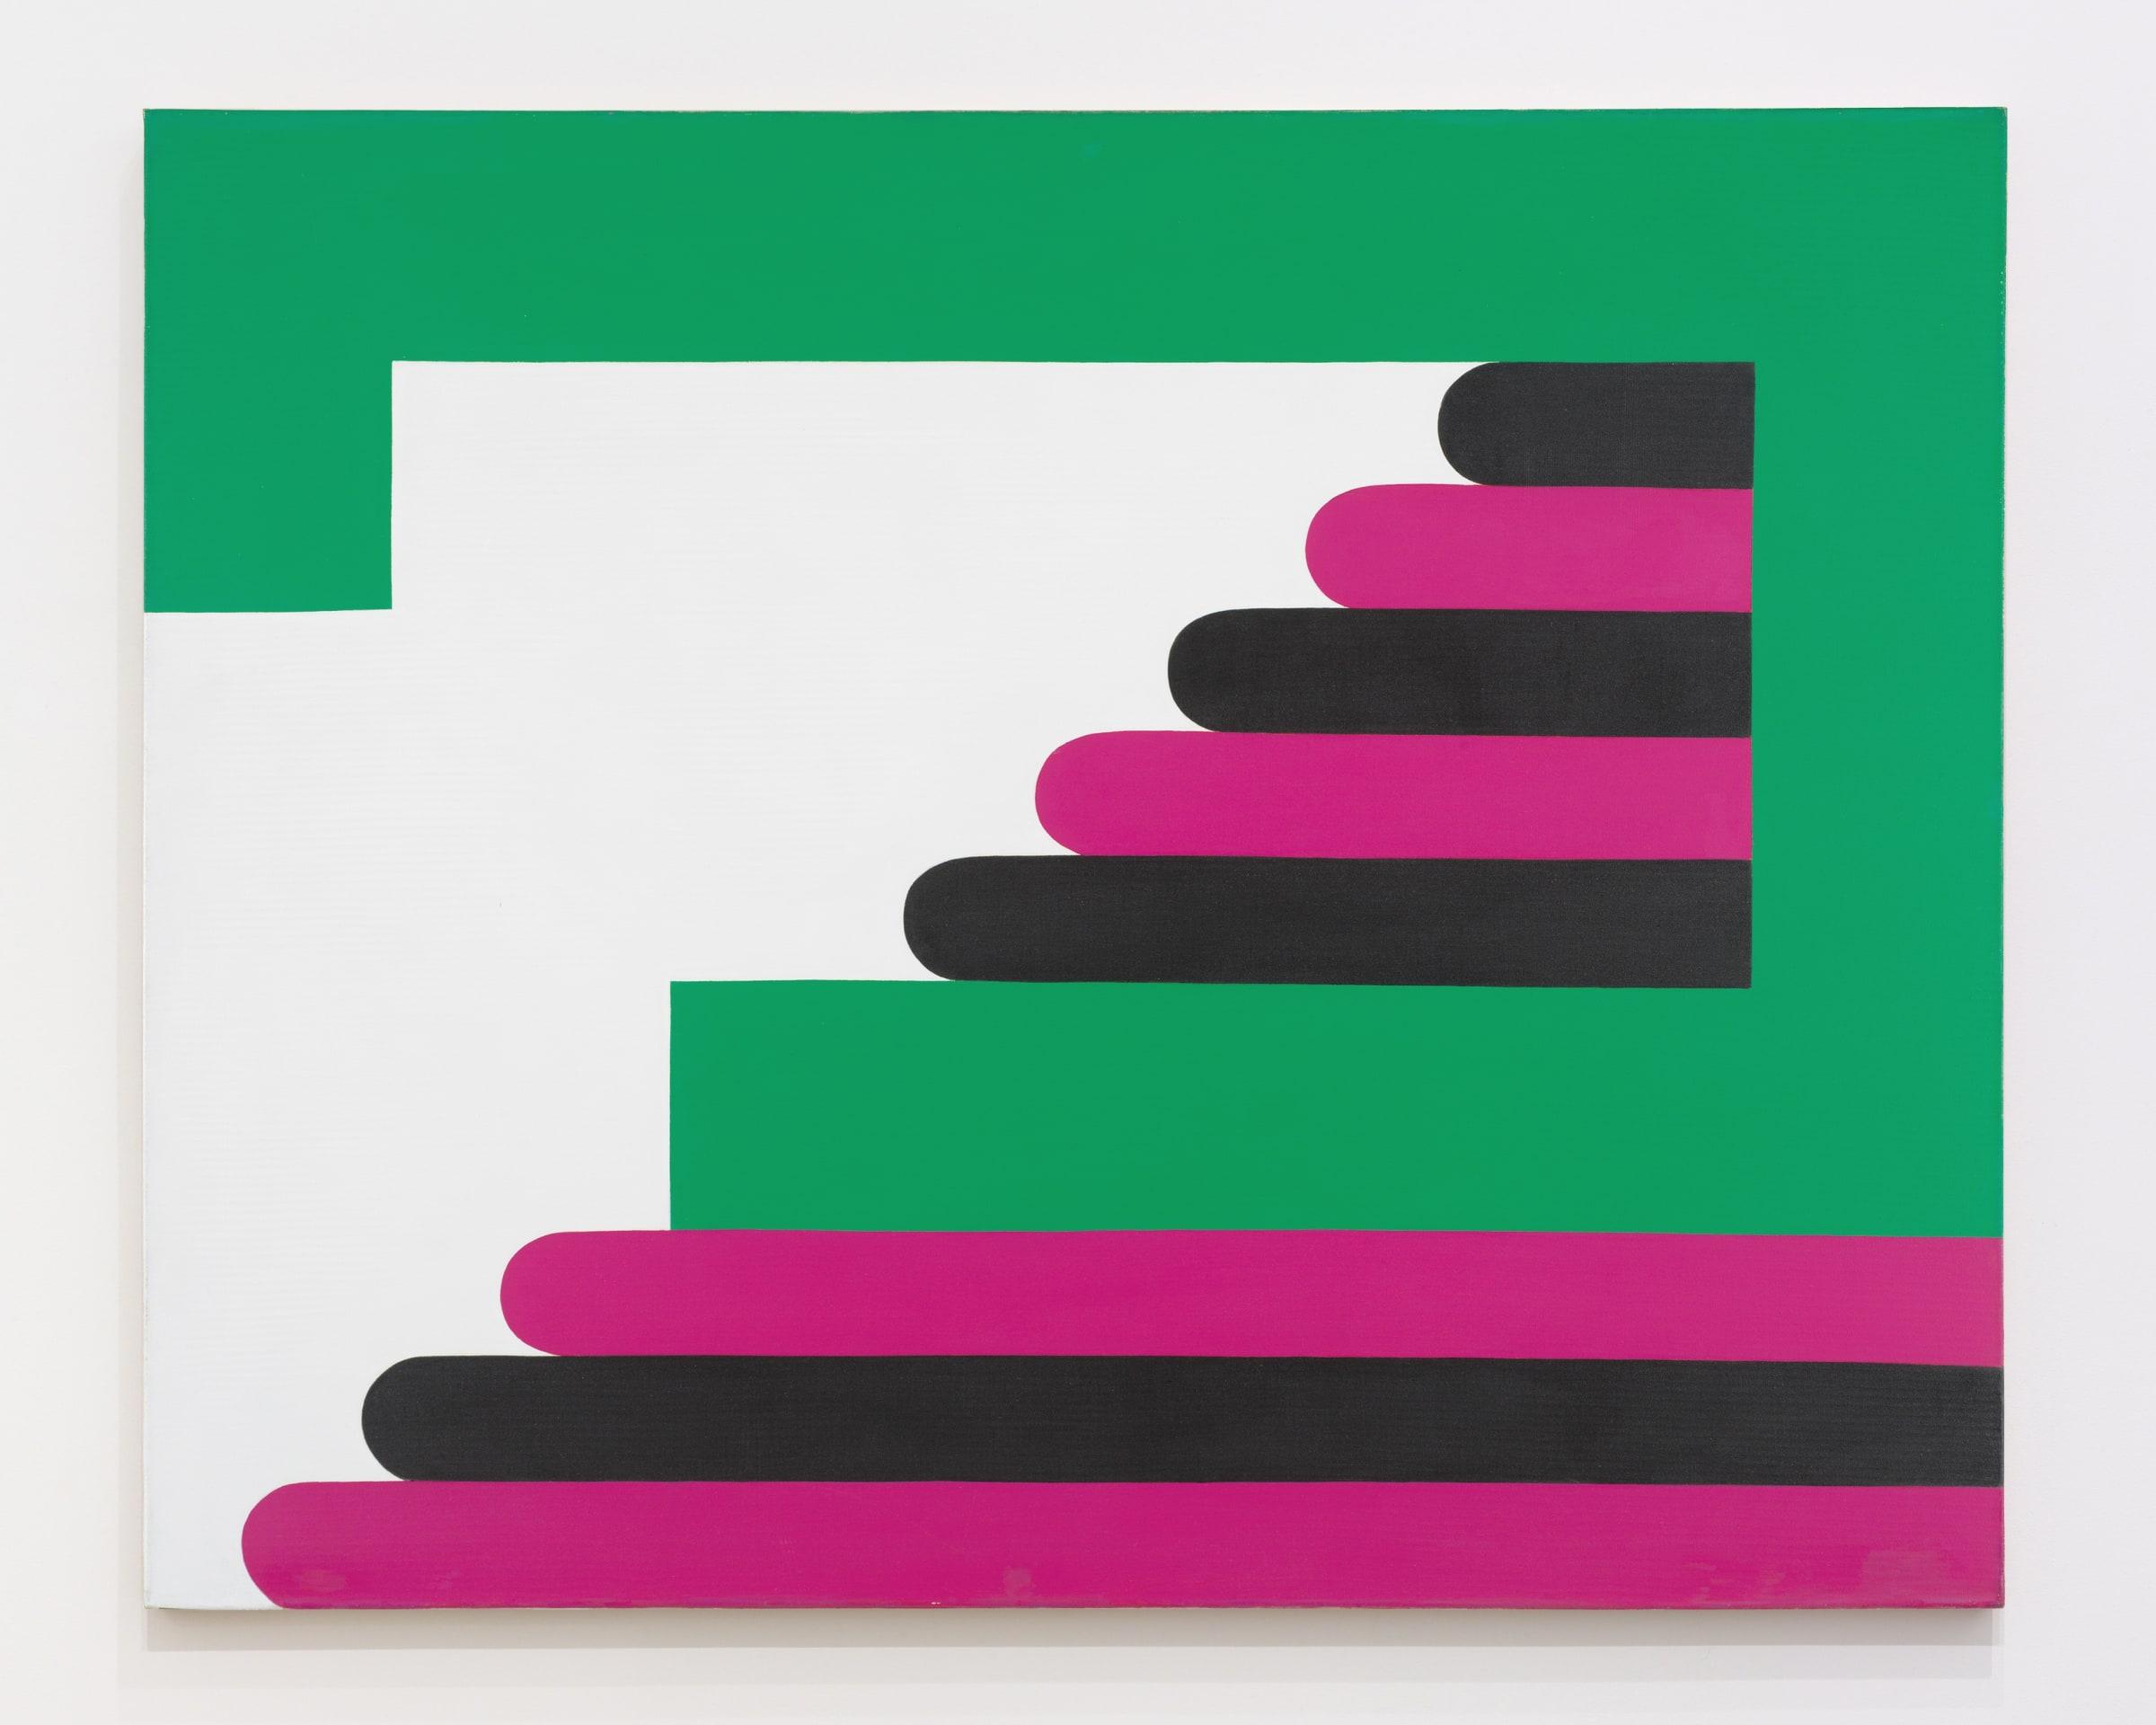 "<span class=""link fancybox-details-link""><a href=""/artists/151-imre-bak/works/10686-imre-bak-green-purple-black-1968/"">View Detail Page</a></span><div class=""artist""><span class=""artist""><strong>IMRE BAK</strong></span></div><div class=""title""><em>Green-Purple-Black</em>, 1968</div><div class=""signed_and_dated"">Signed, titled and dated on reverse</div><div class=""medium"">Acrylic on canvas</div><div class=""dimensions"">120 x 150 cm<br /> 47 1/4 x 59 inches</div>"